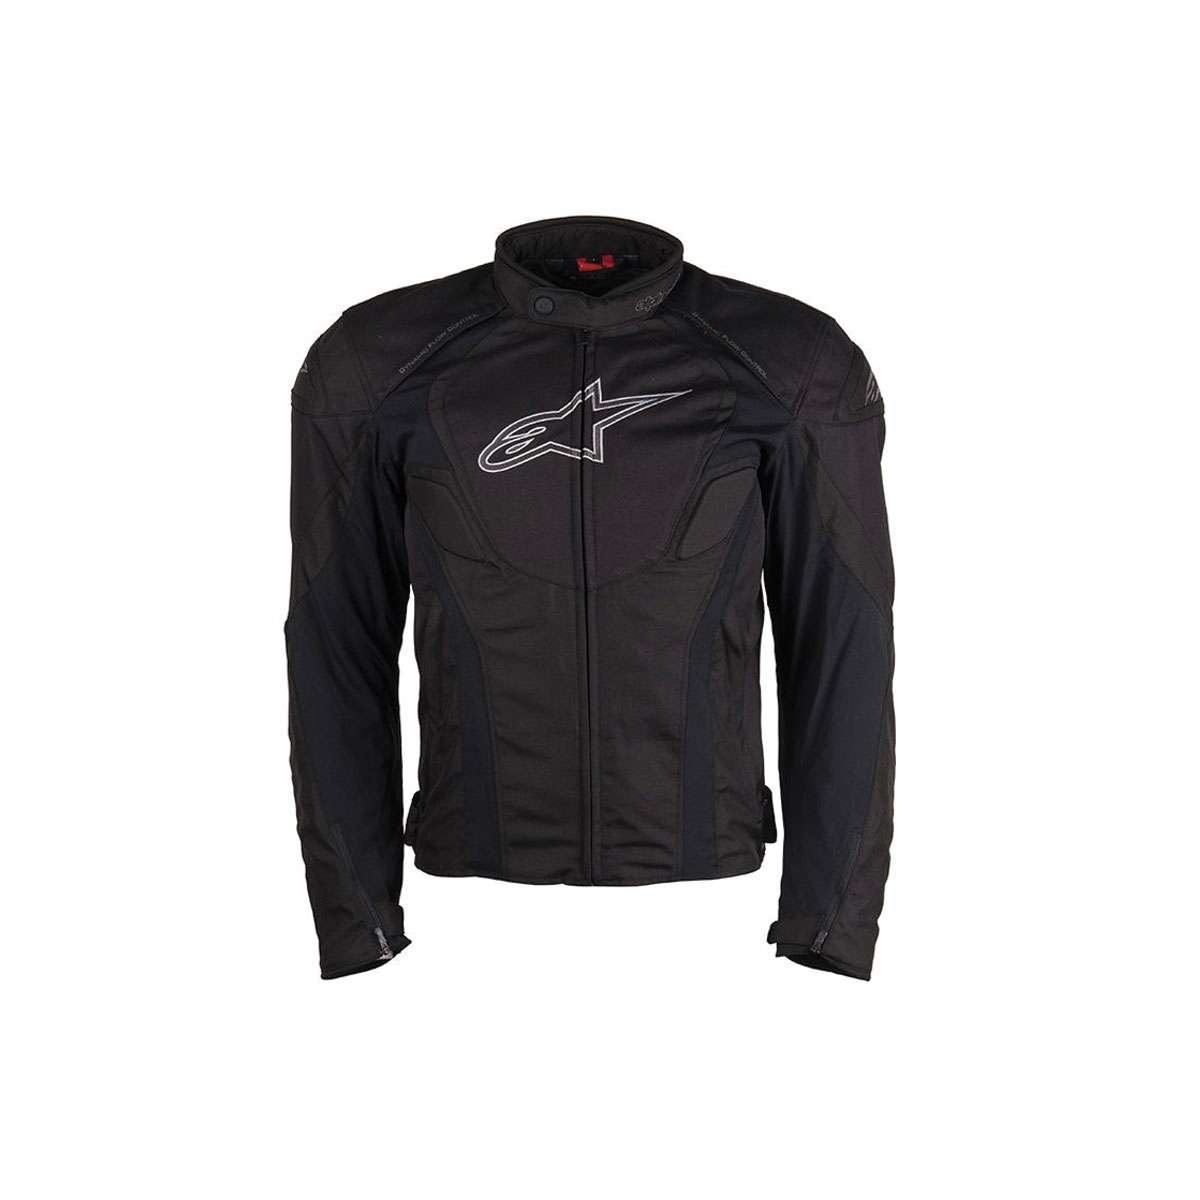 Taille L Noir//Blanc//Rouge Alpinestars Blouson moto T-jaws Waterproof